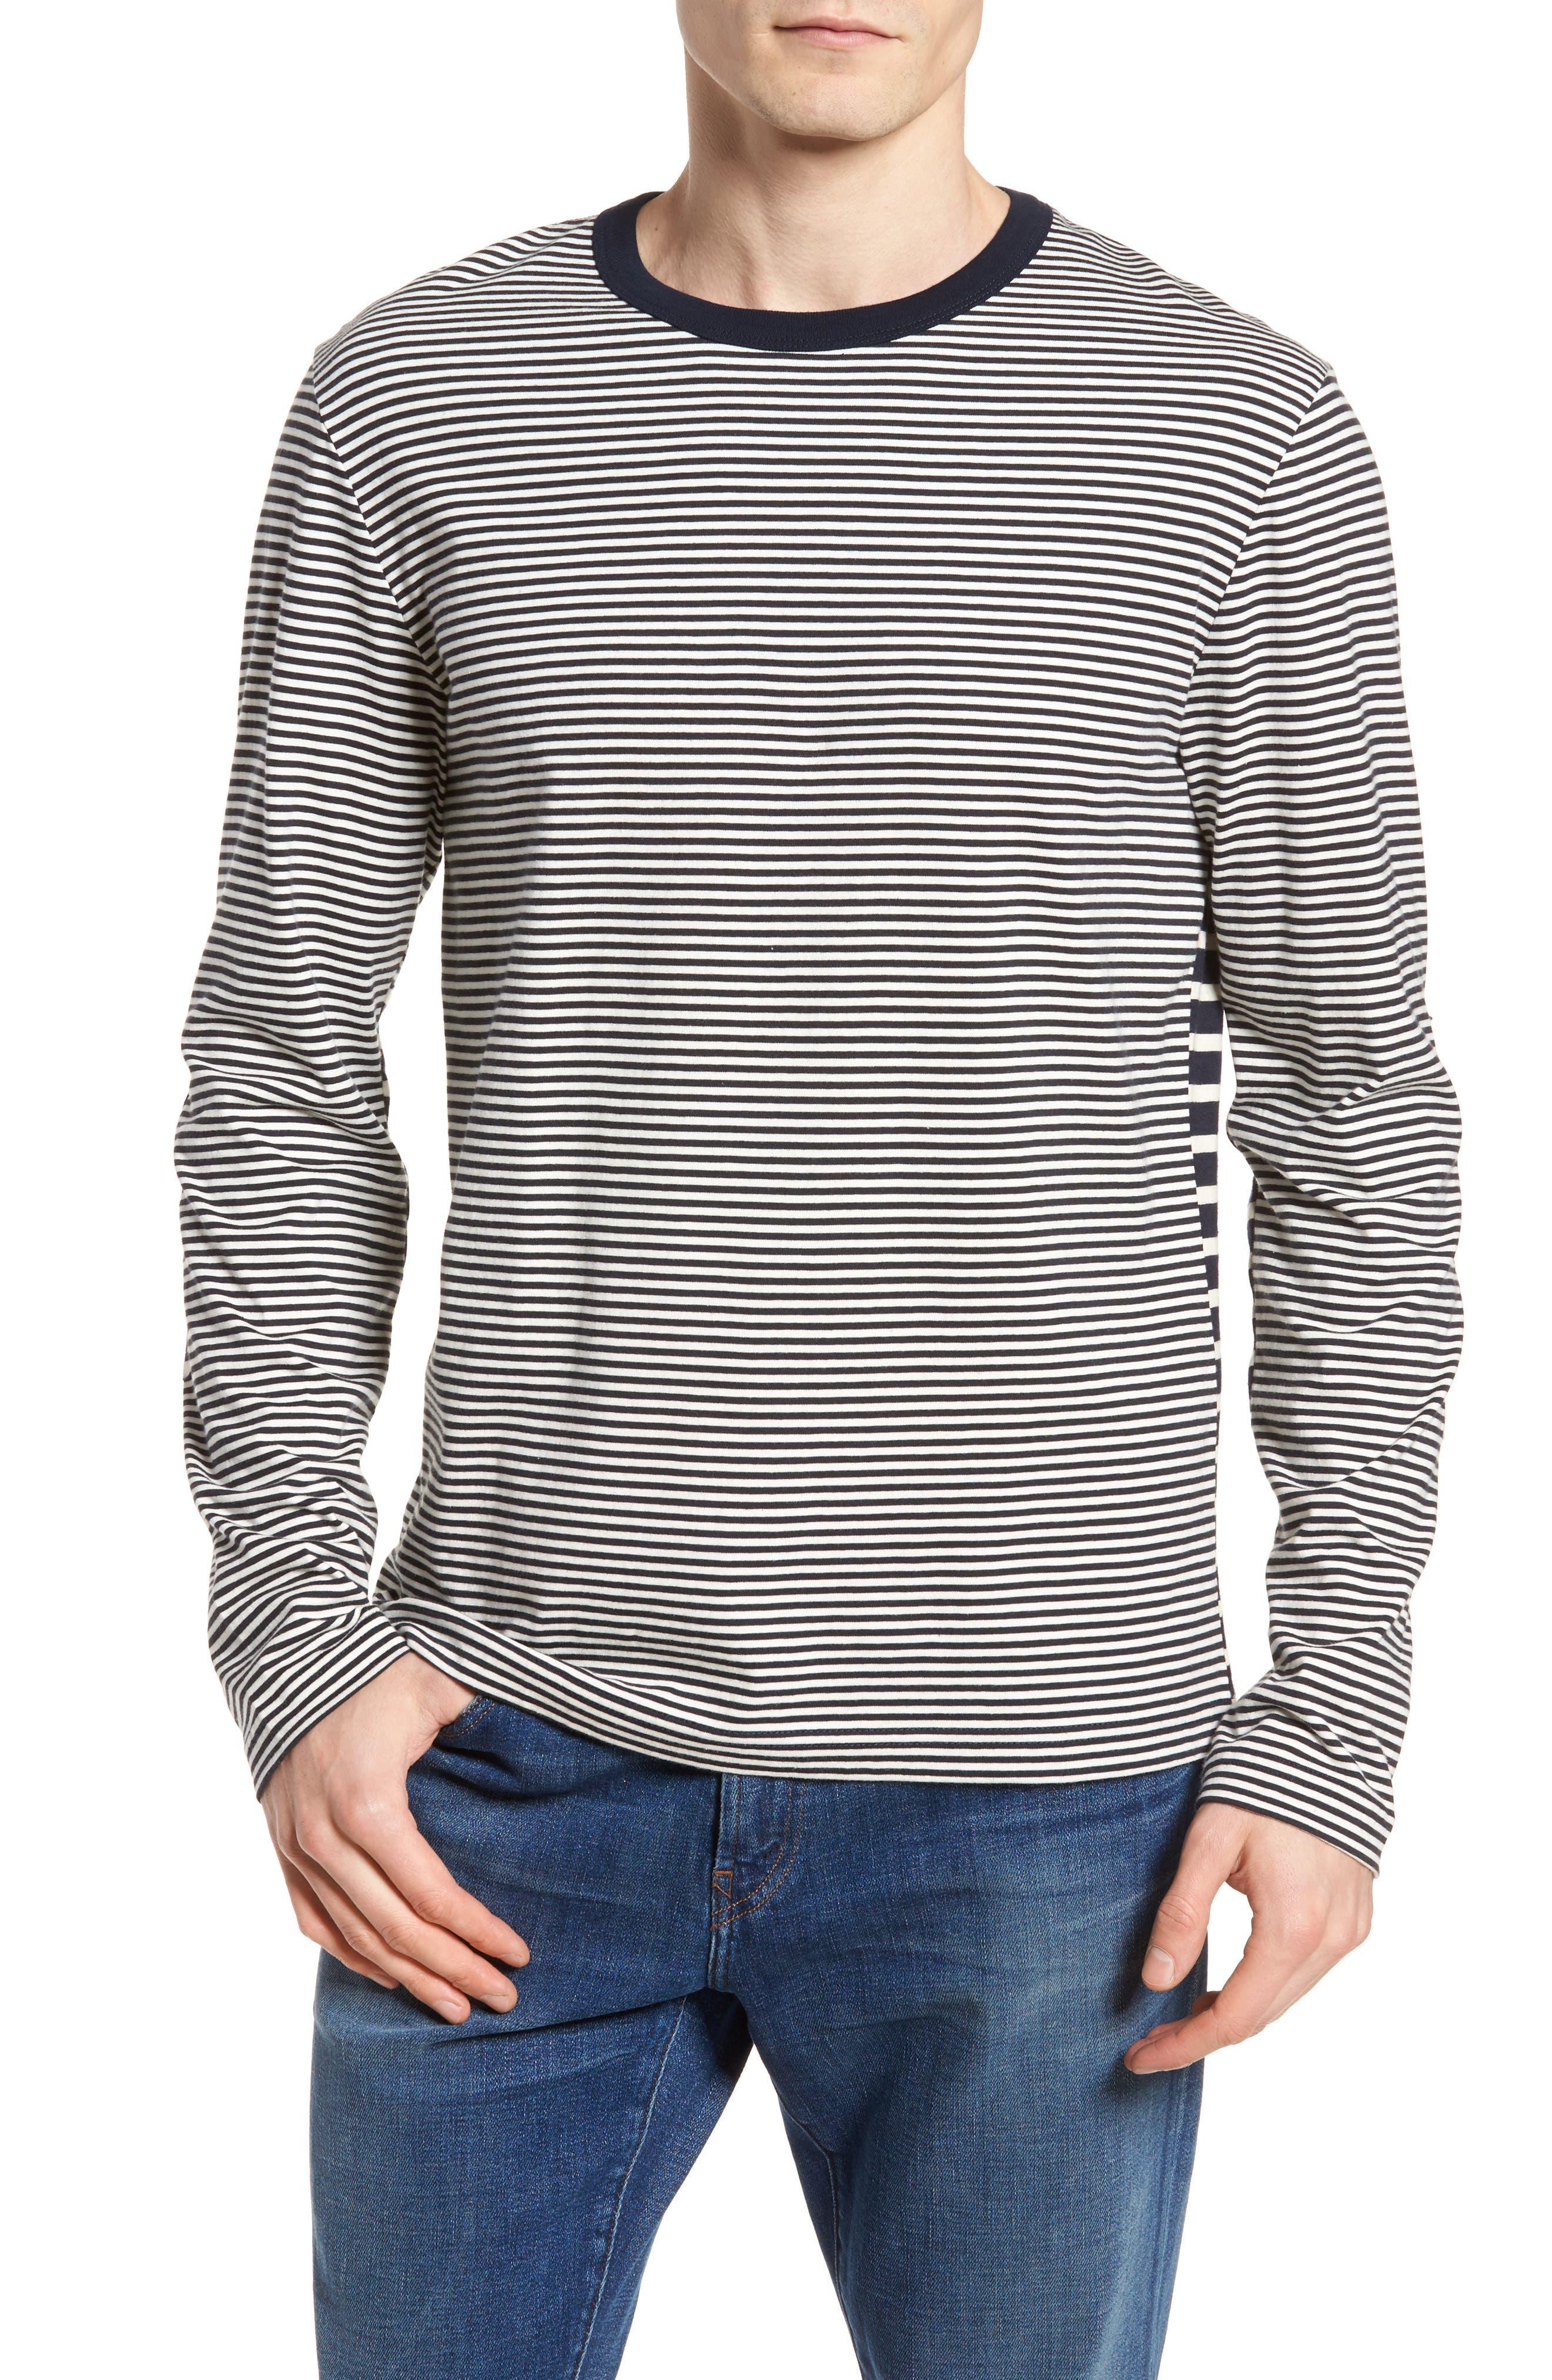 Mix Stripe Long Sleeve T-Shirt,                         Main,                         color, 020